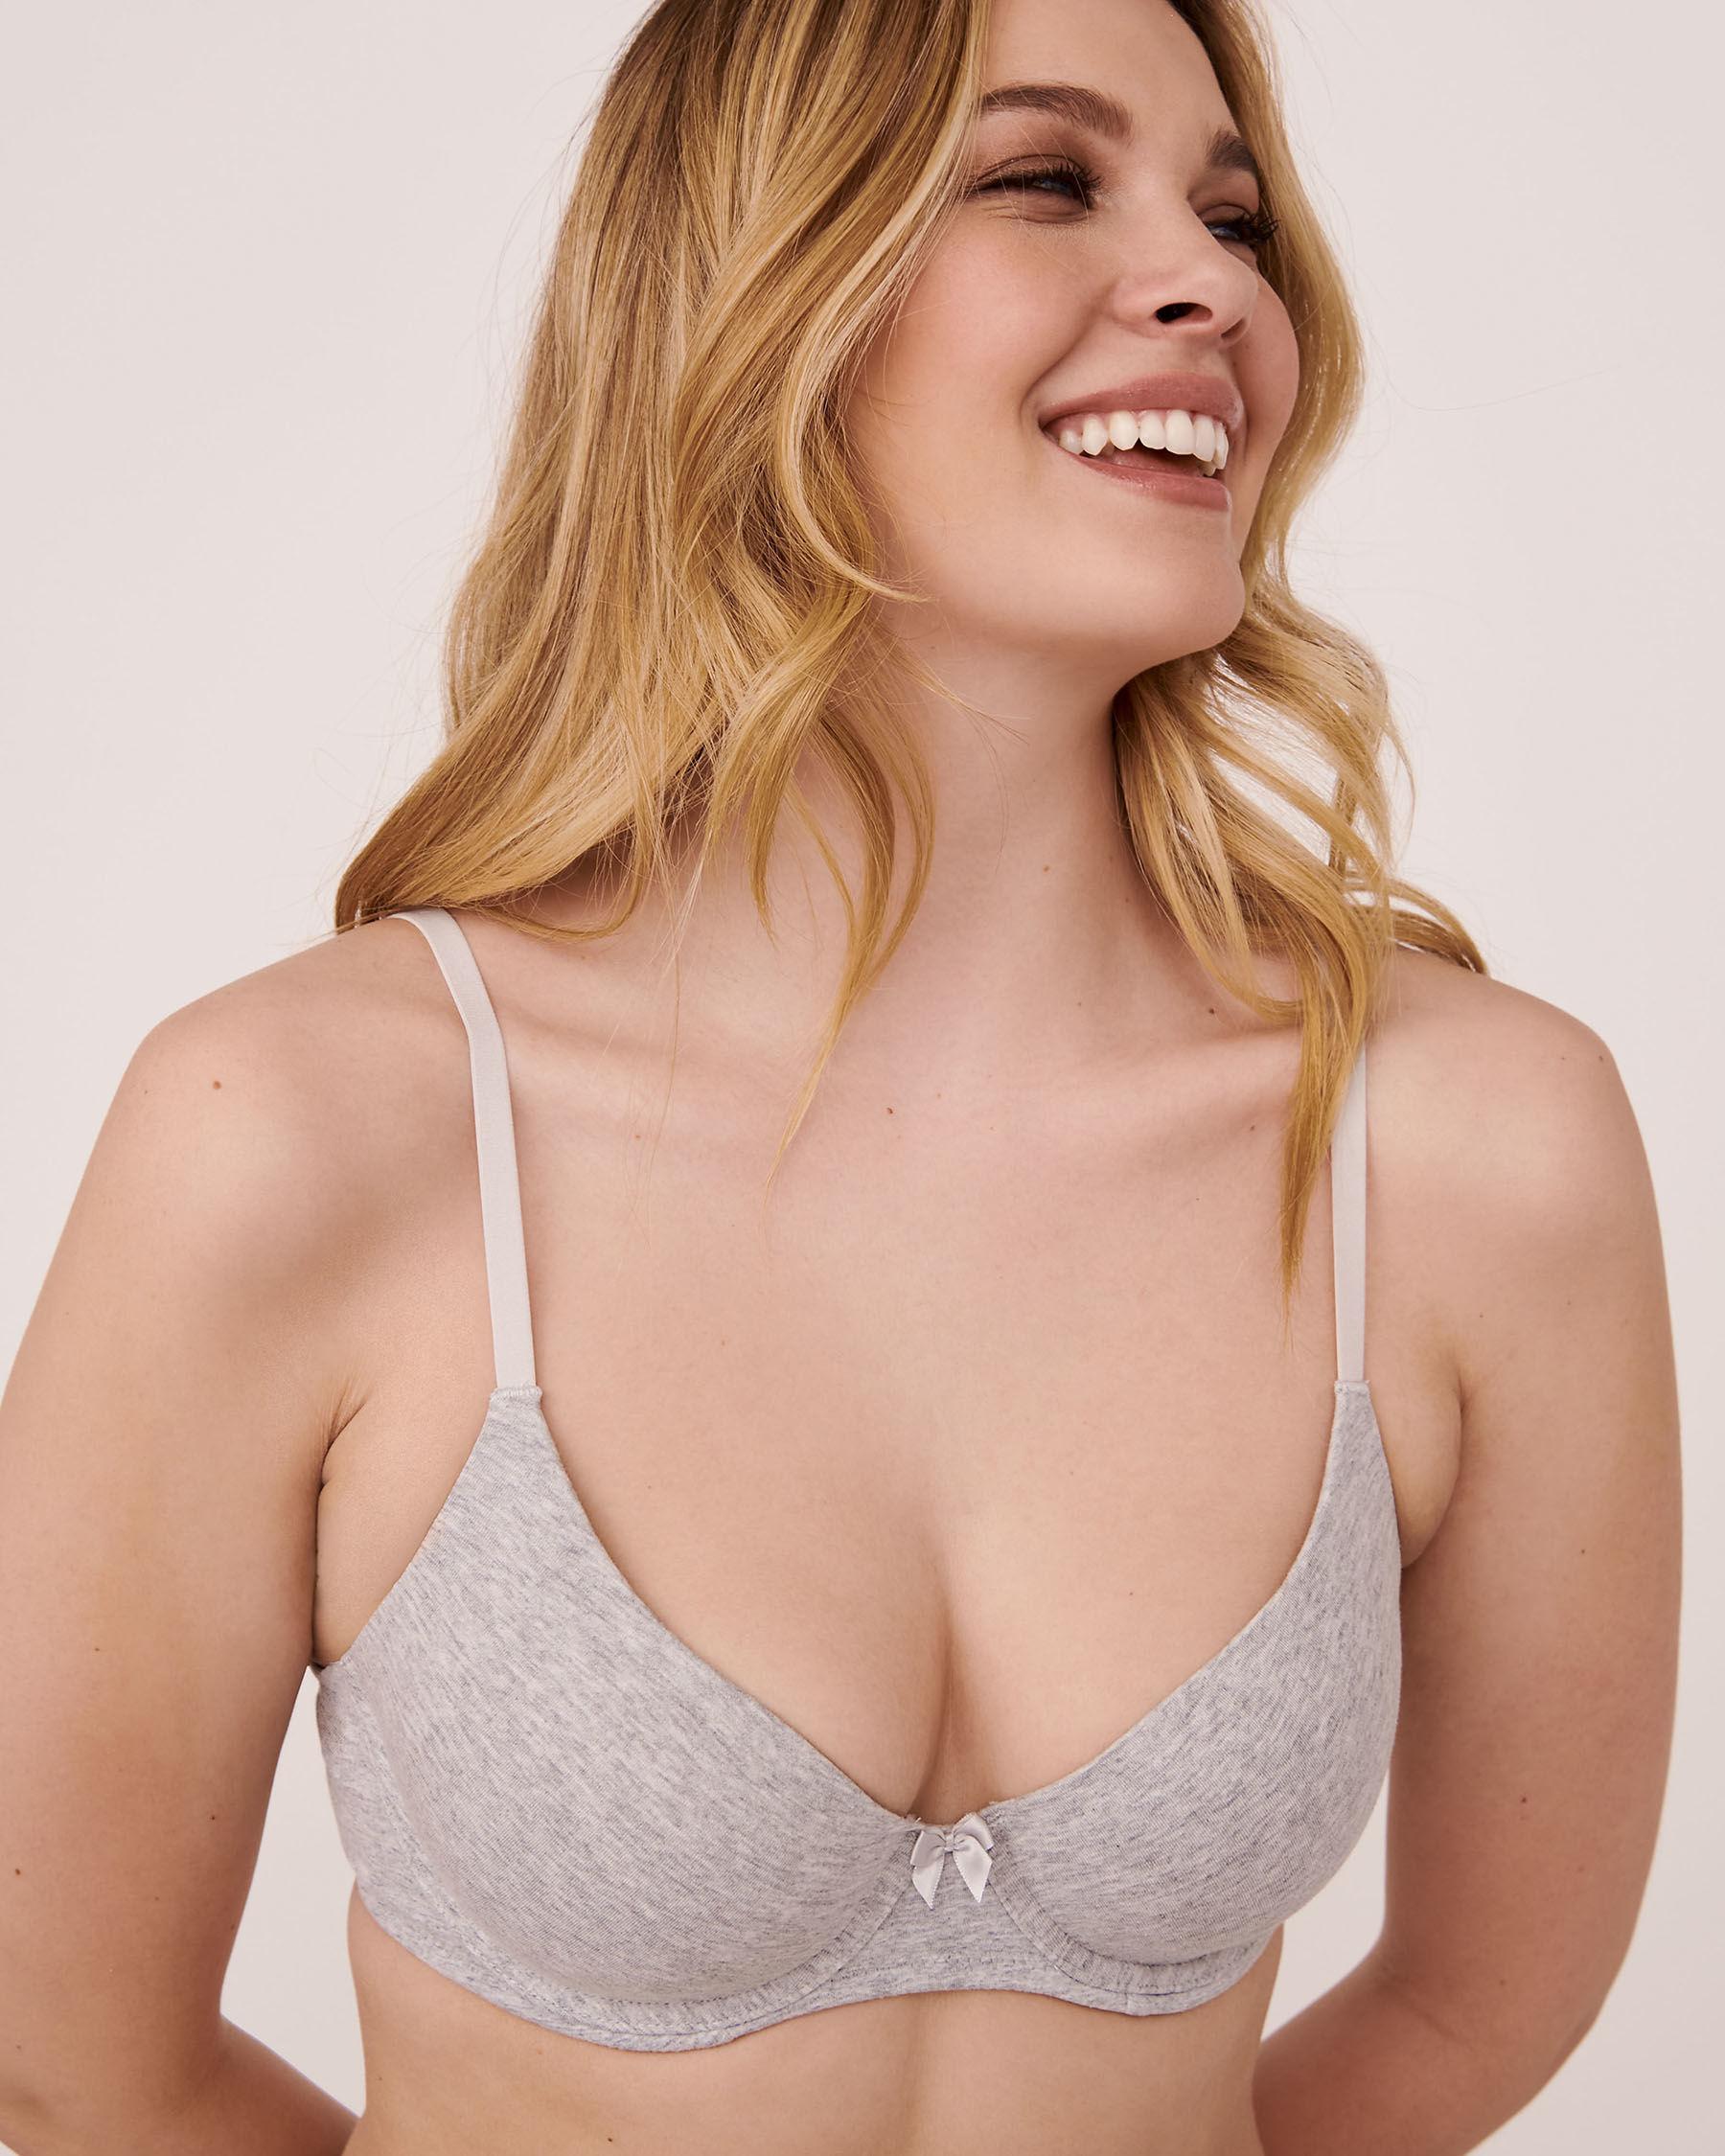 LA VIE EN ROSE Lightly Lined Cotton Bra Grey 558-113-1-00 - View1